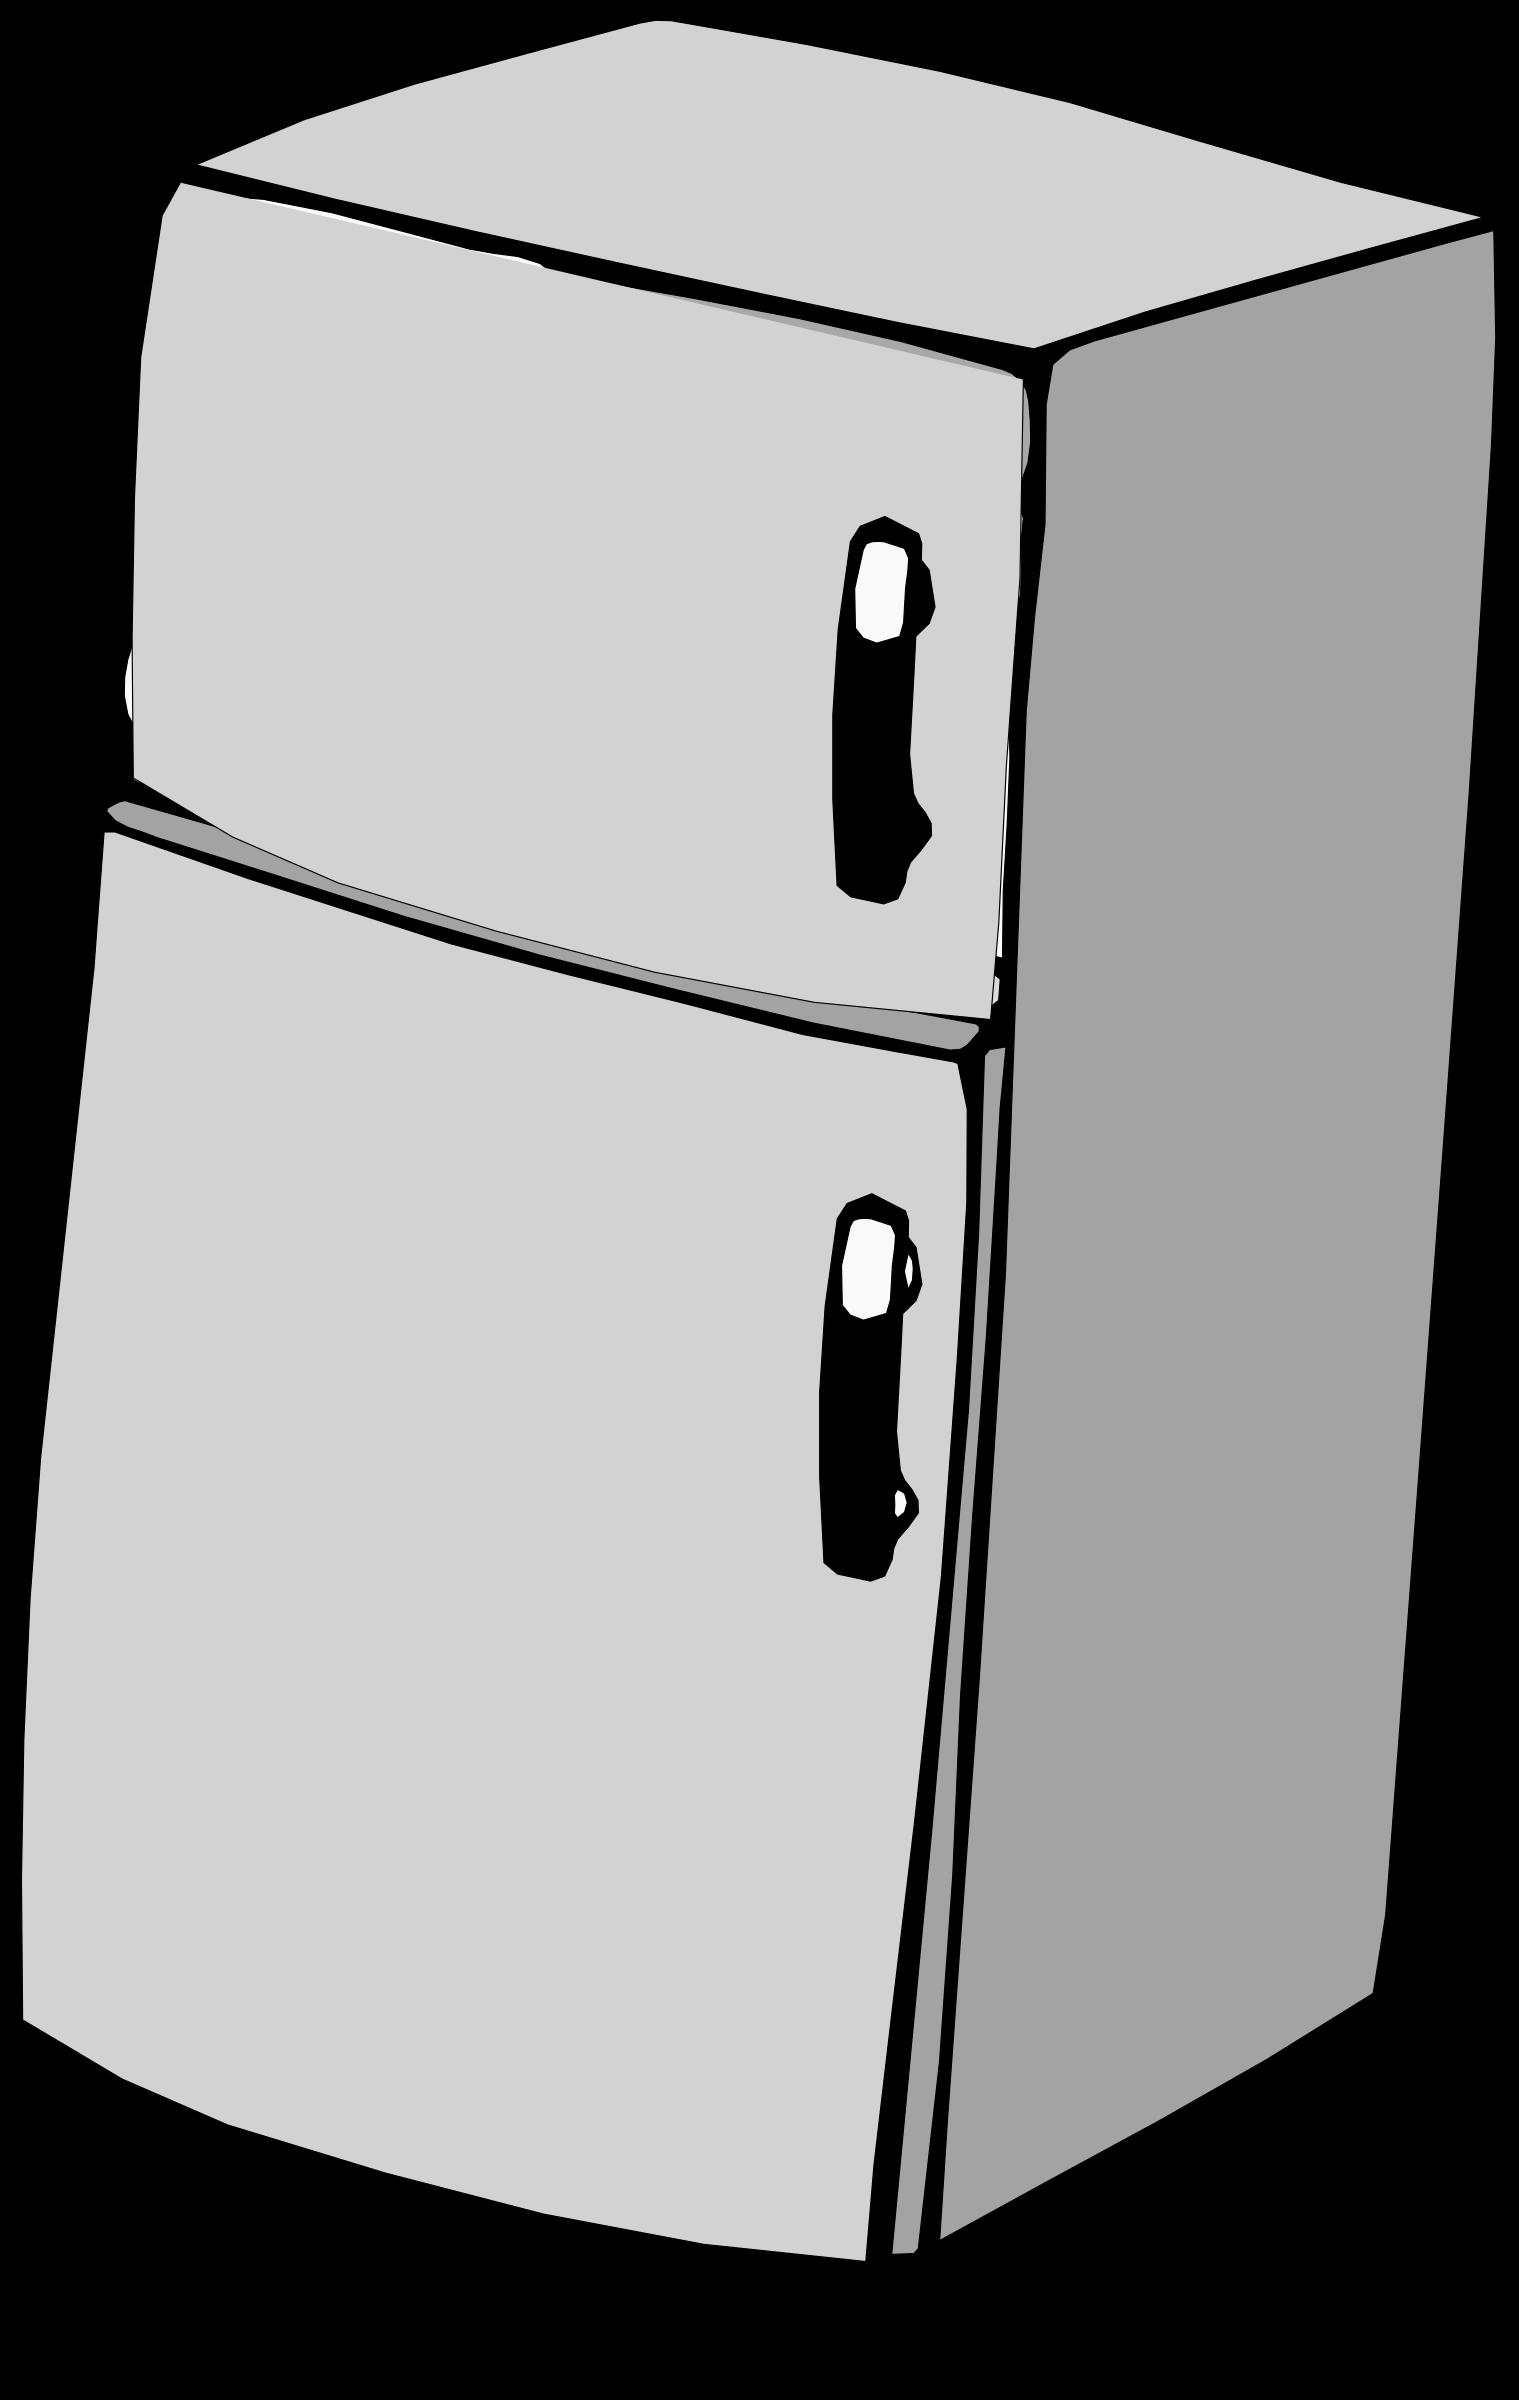 clipart refrigerator